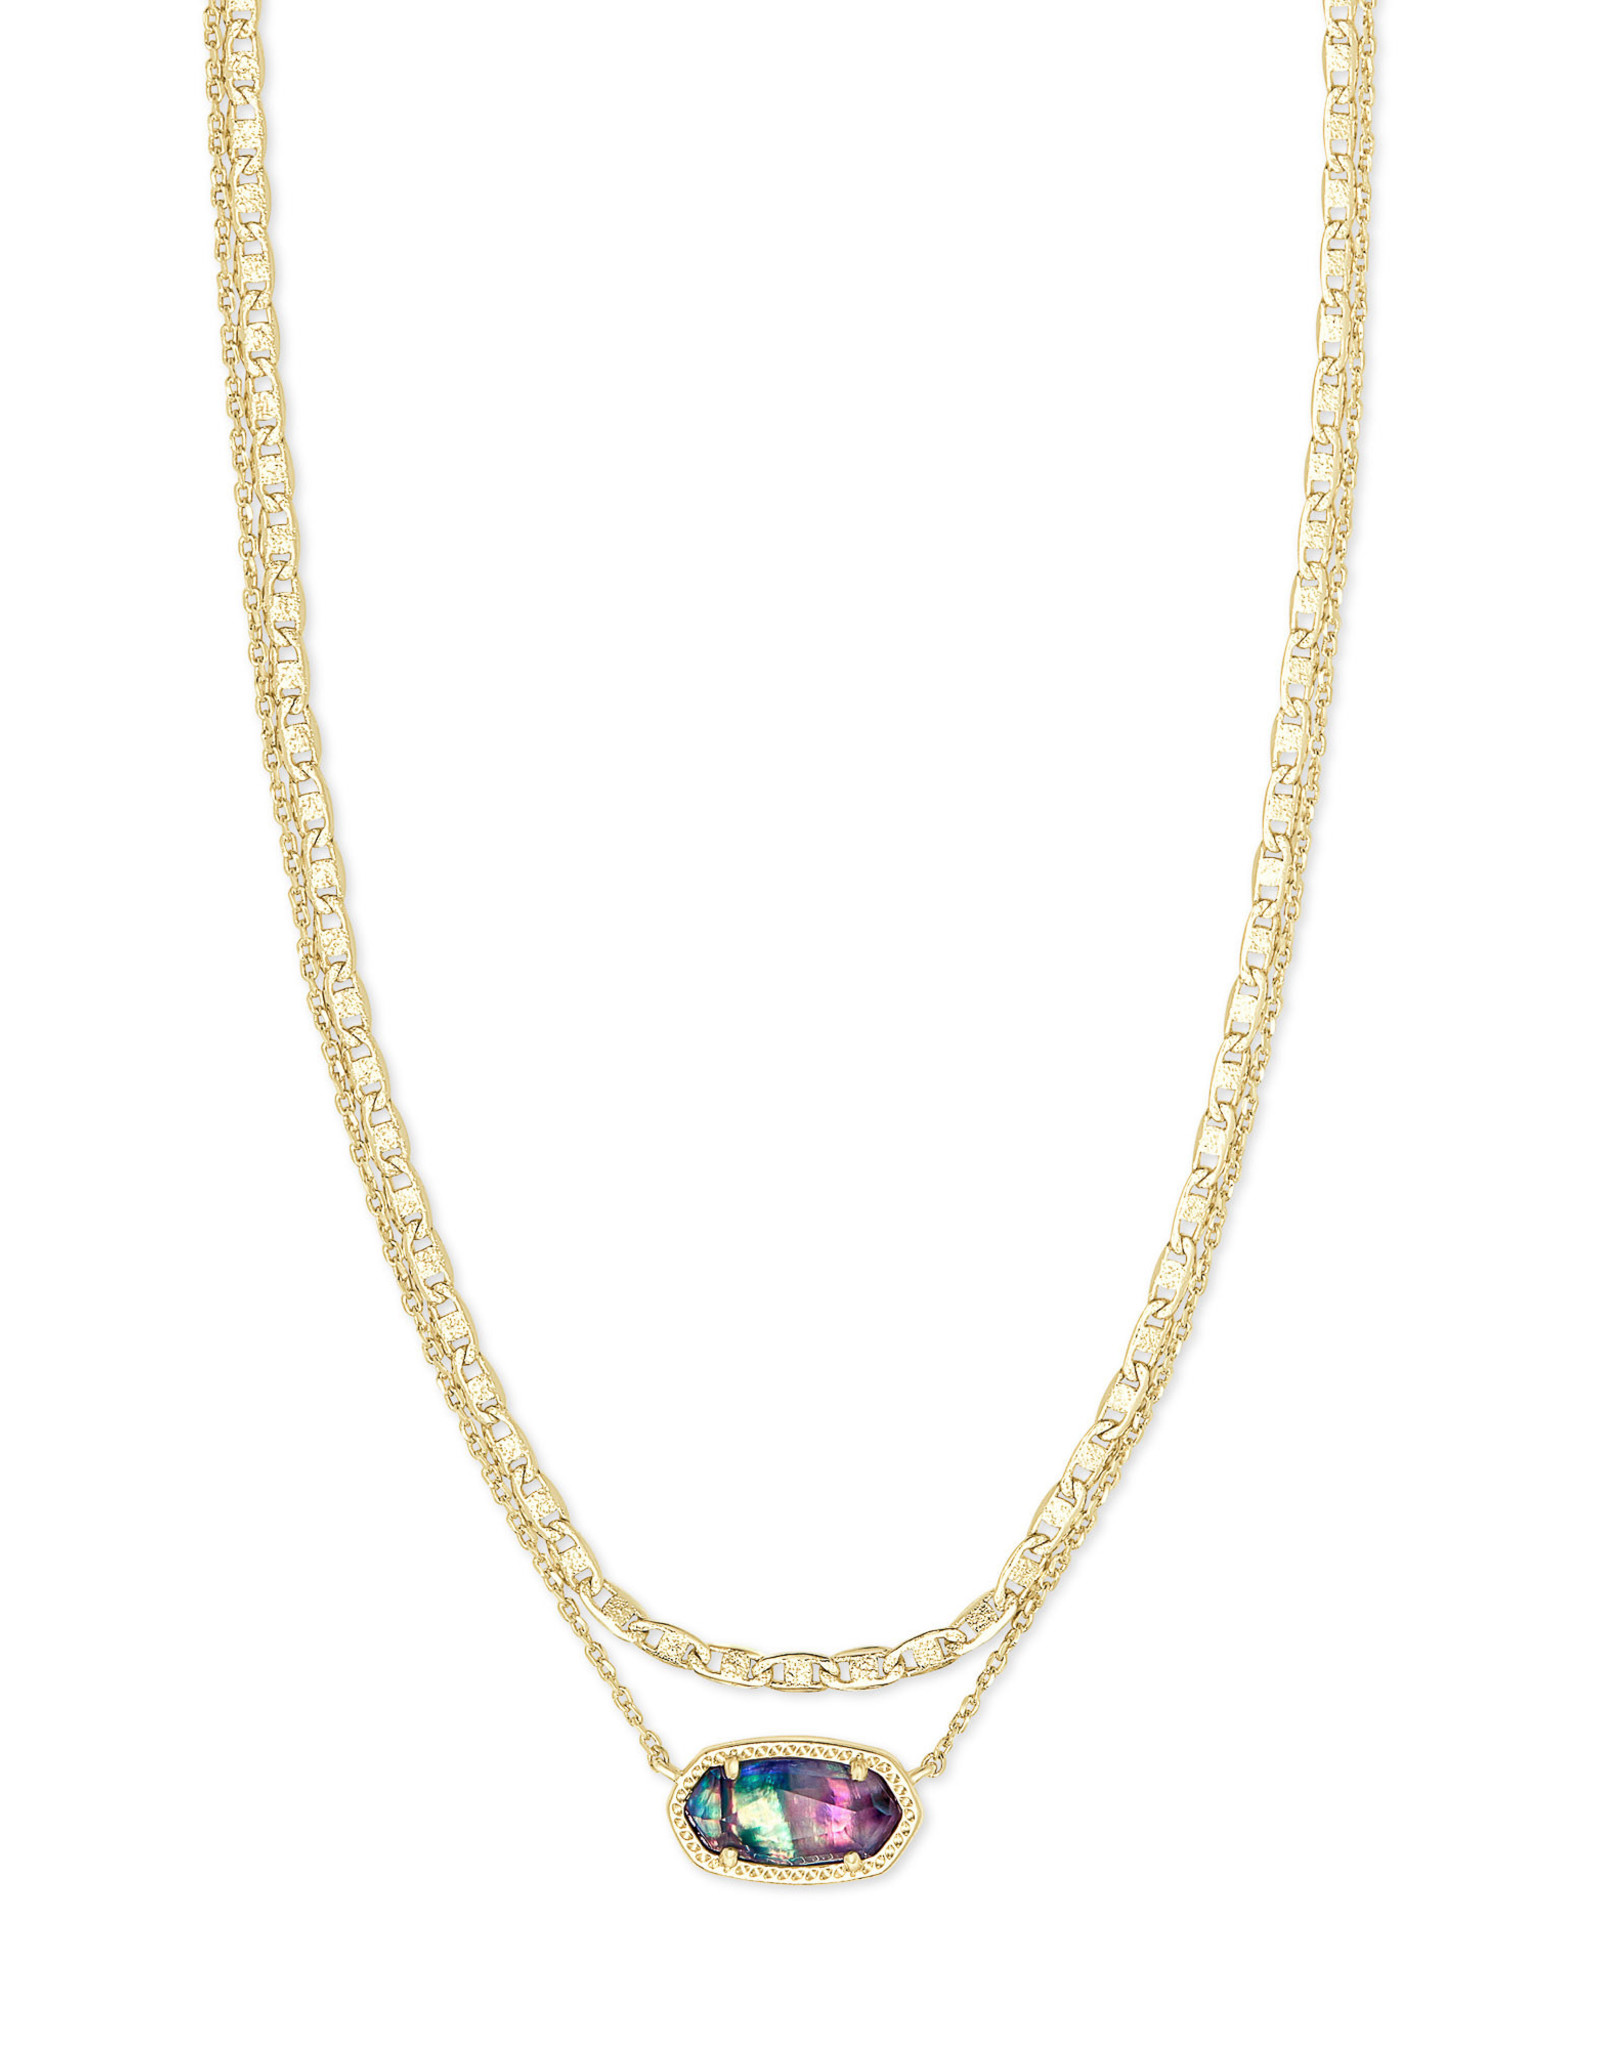 Kendra Scott Elisa Multi Strand Necklace - Lilac Abalone/Gold